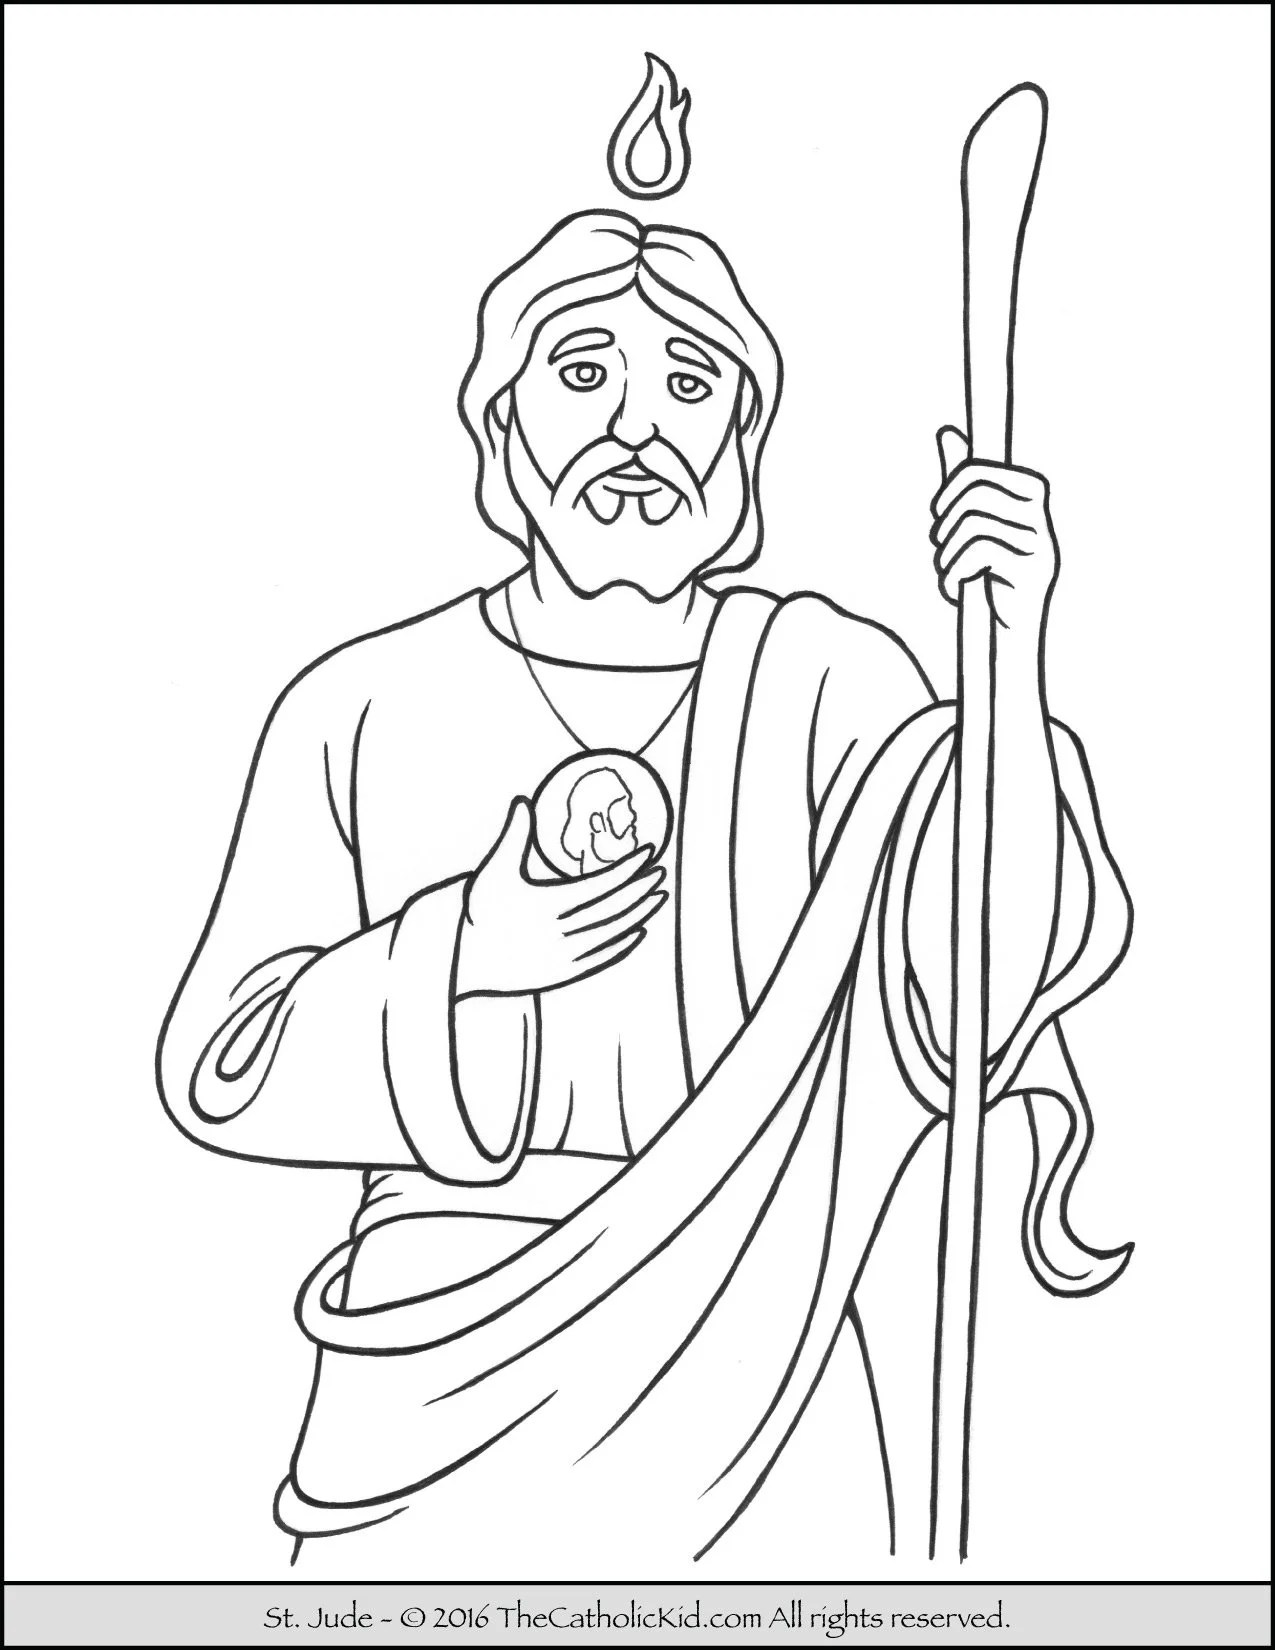 Catholic Saints Coloring Pages : catholic, saints, coloring, pages, Saint, Coloring, Catholic